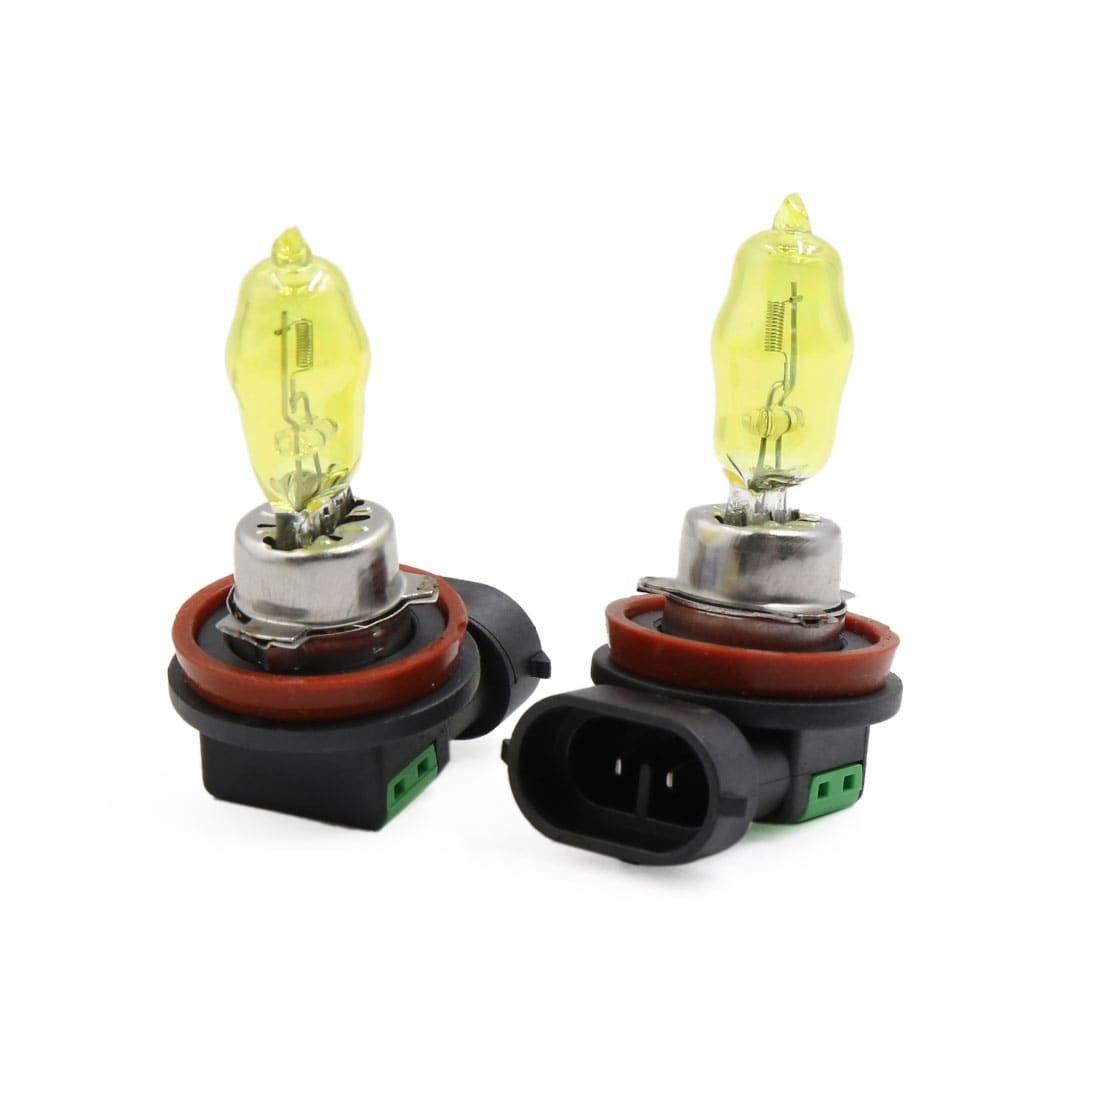 27w Super White Xenon Headlight Bulbs 12v For Car Auto* 881 High Bright H27W//2